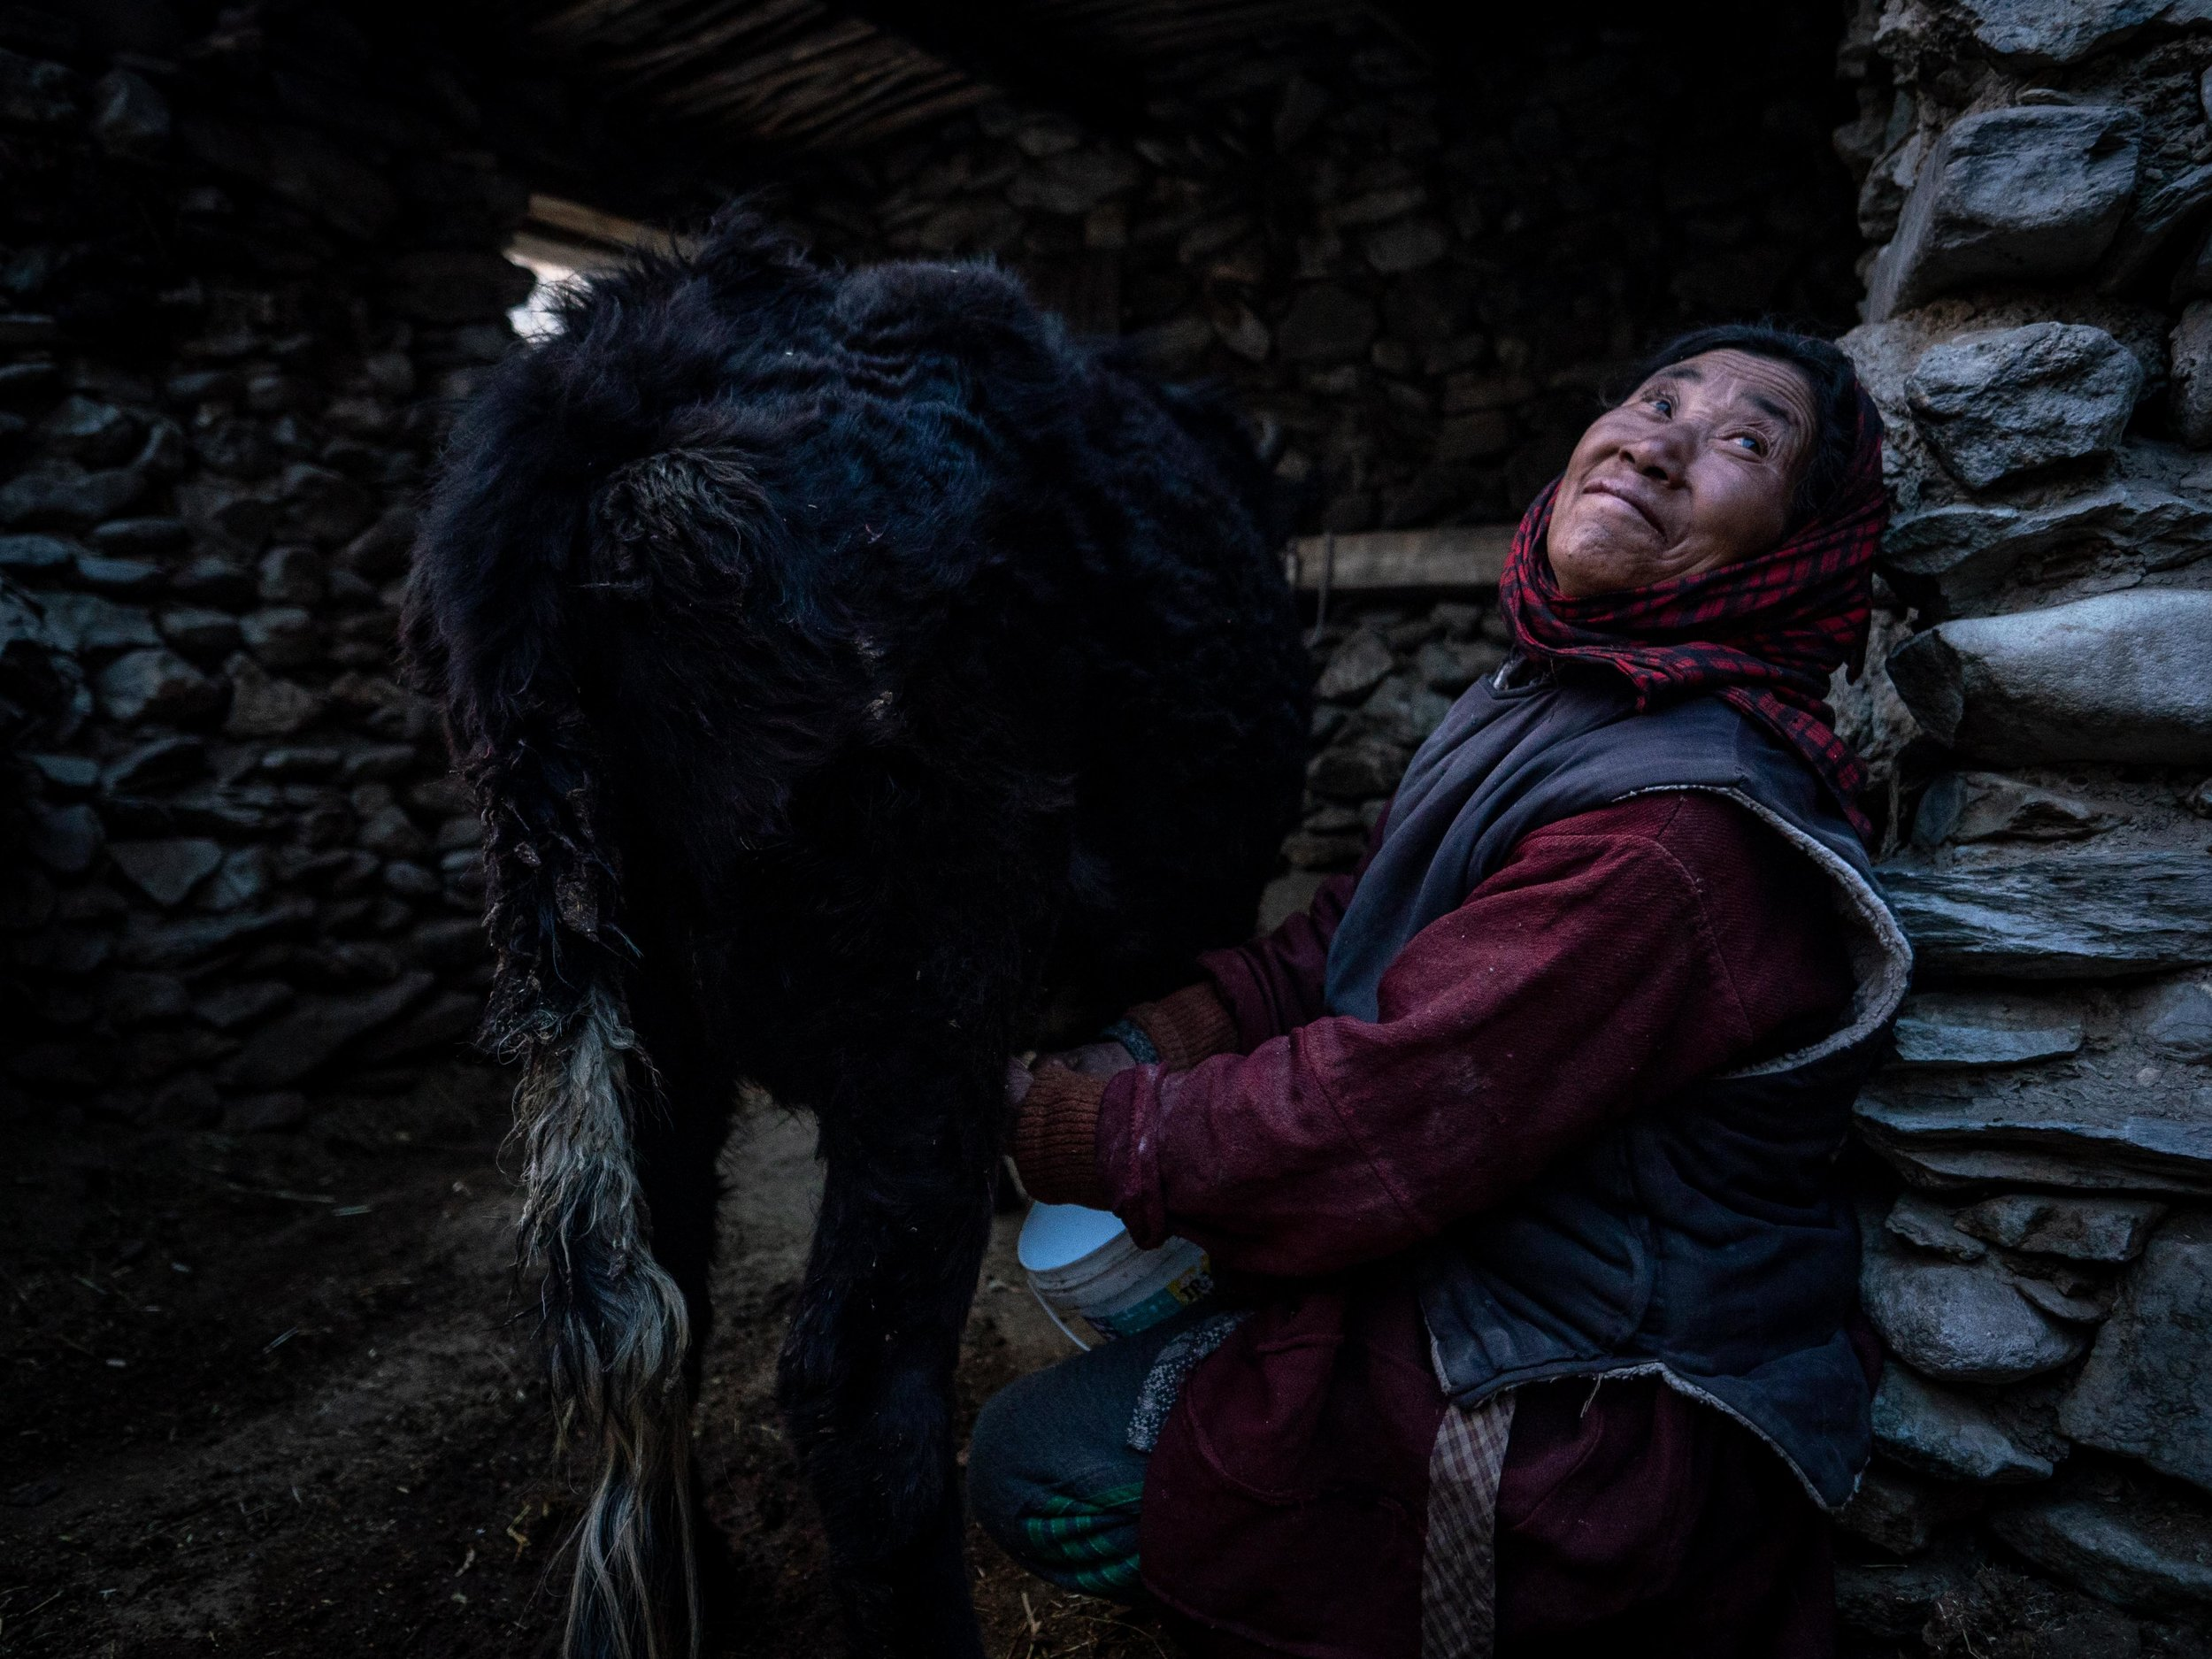 Padma Shingo milks her cow